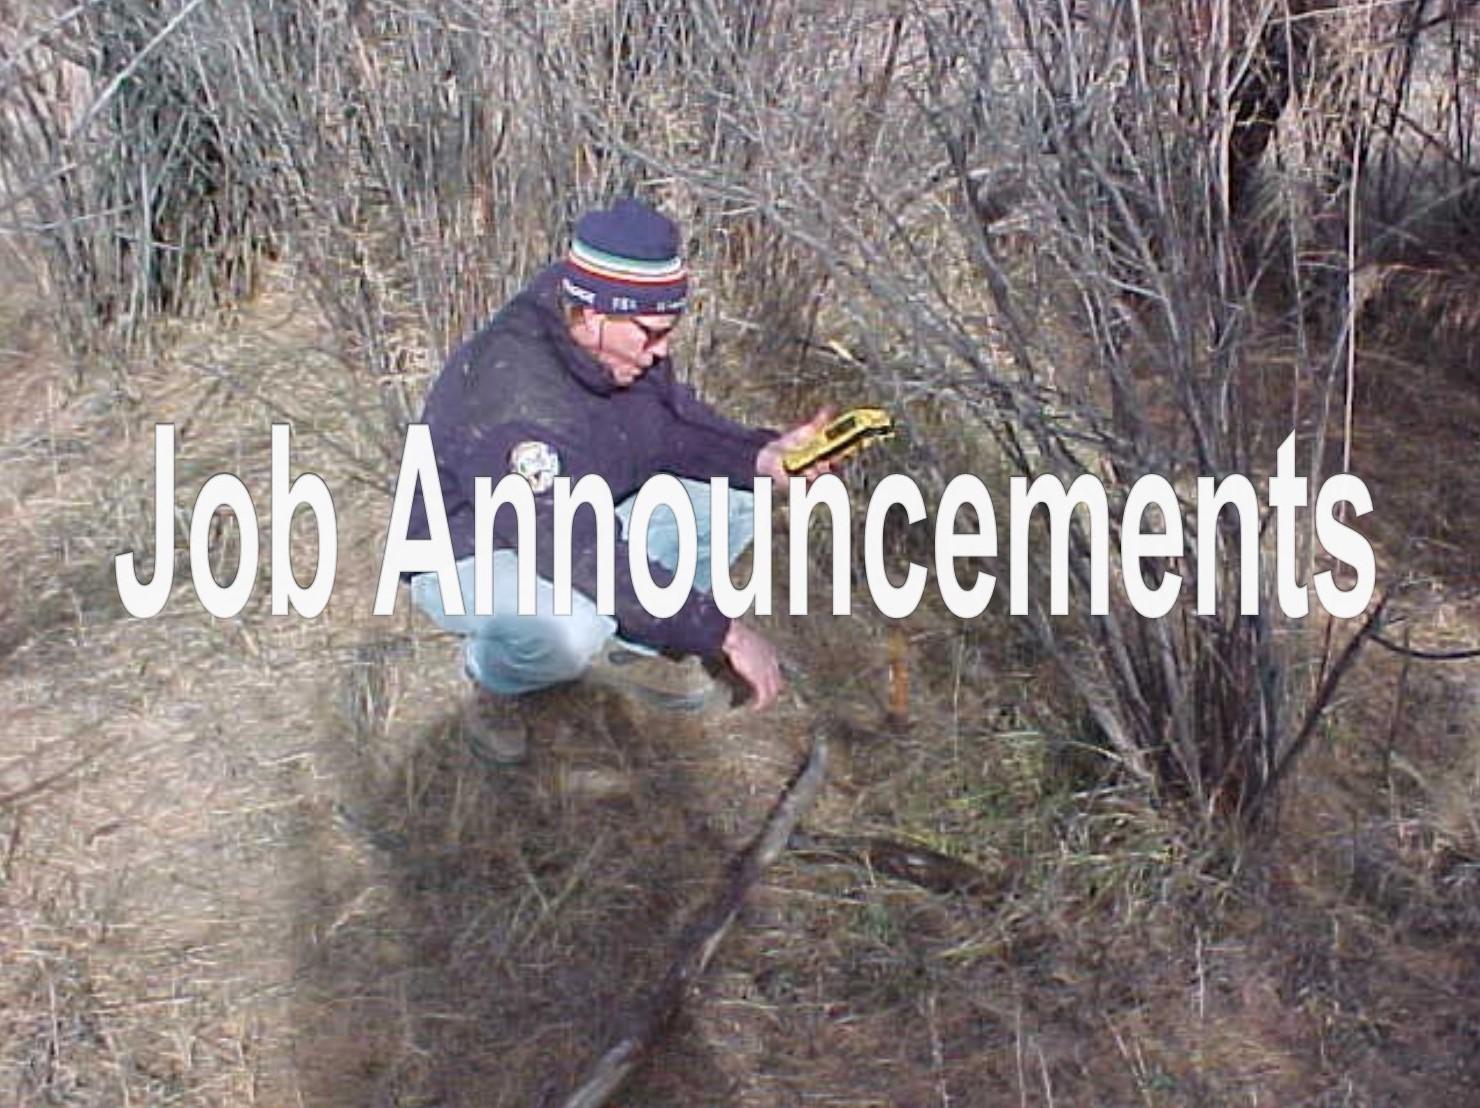 David Graf, Water Resource Specialist, surveying a grove of tamarisks -   Dave Graf, Colorado Parks and Wildlife